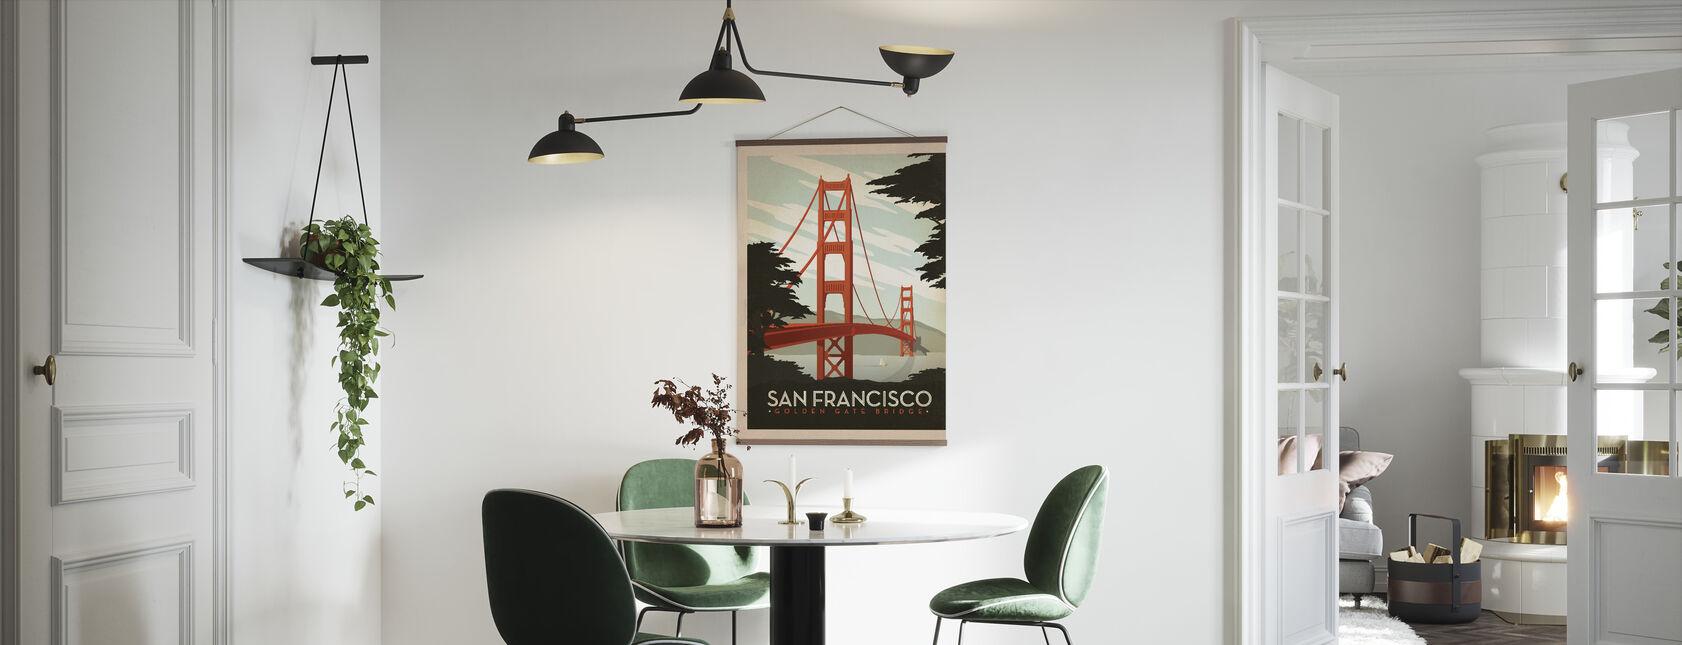 San Francisco - Juliste - Keittiö